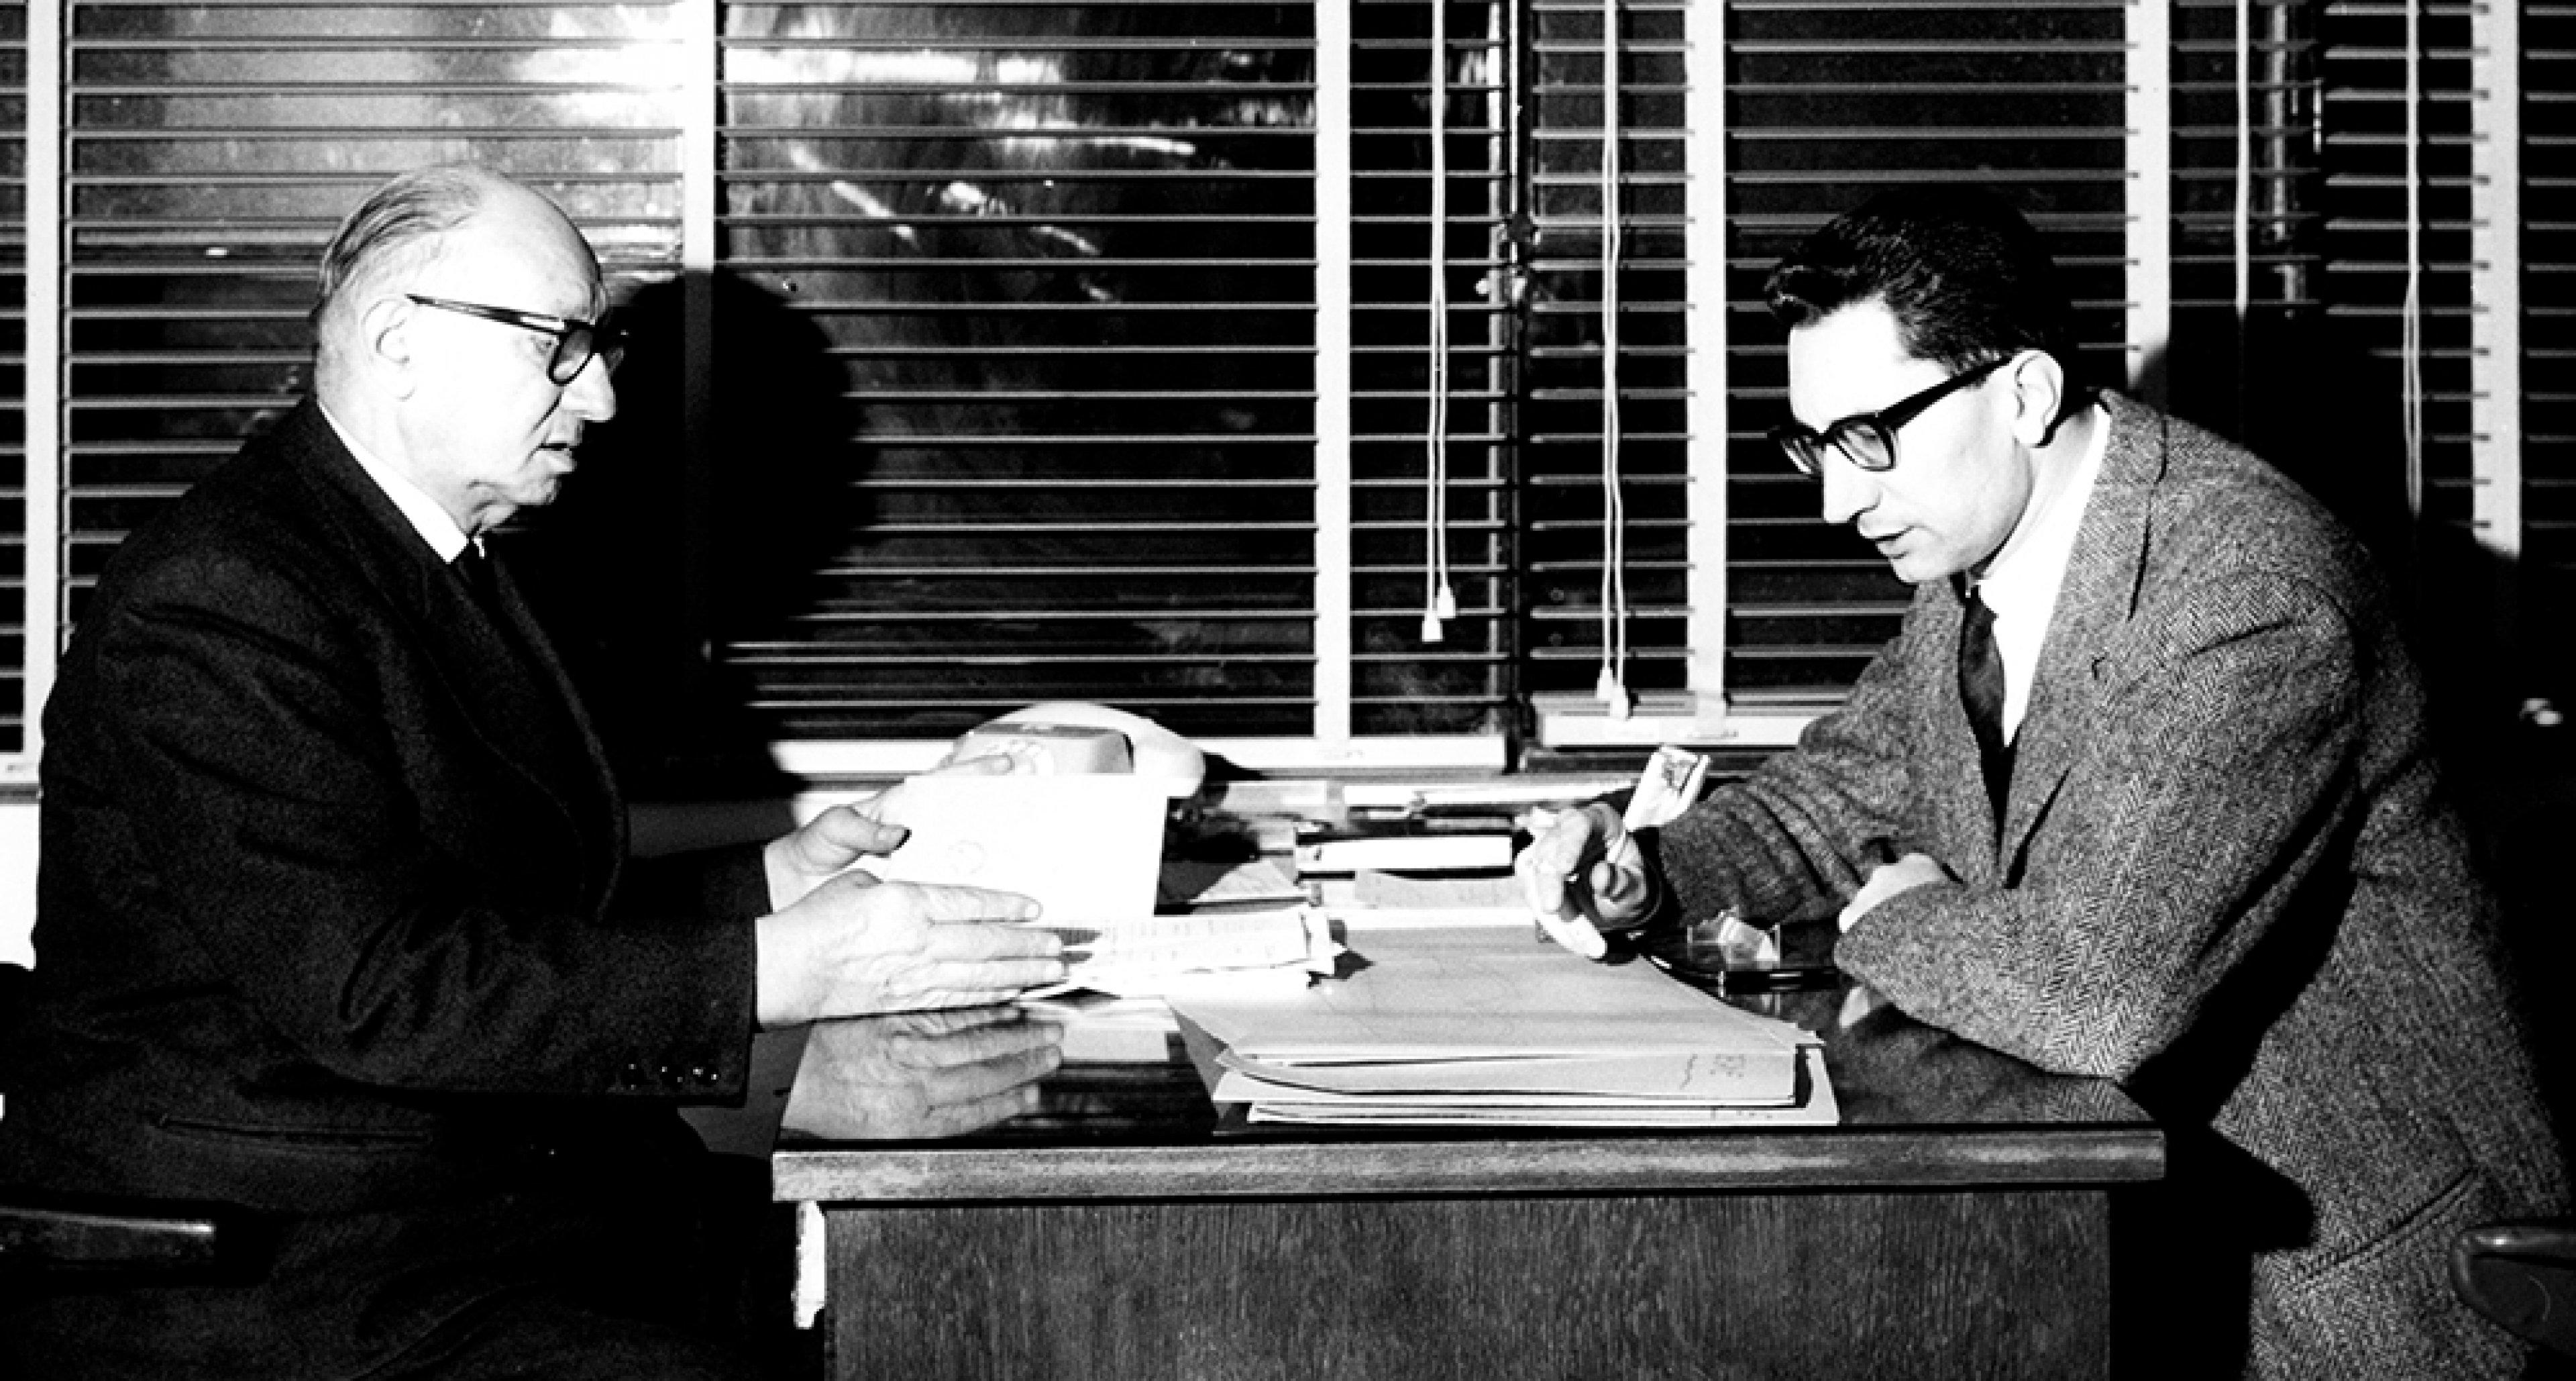 Ugo Zagato and son Elio Zagato in Italy, 1963. © TCI/EyeOn/UIG via Getty Images